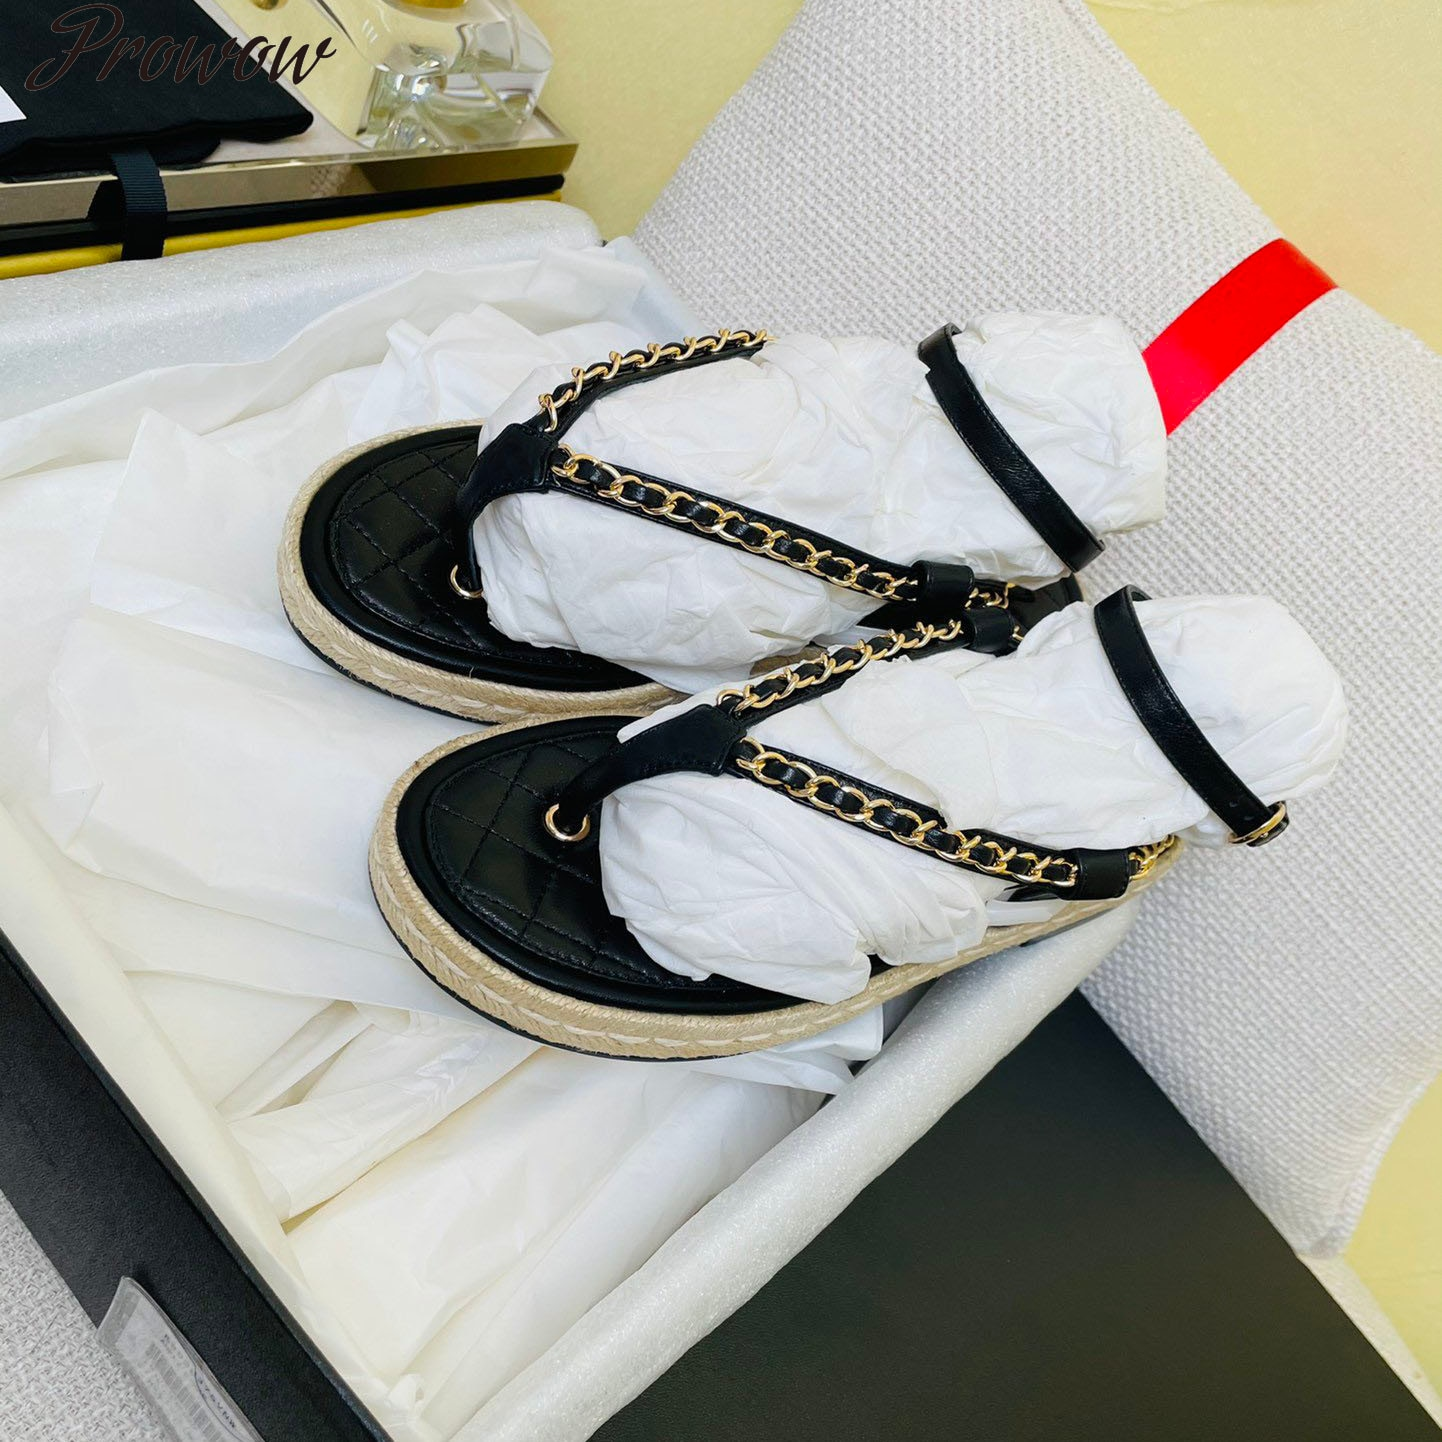 Prowow Women Sandals Fisherman Shoes Chain Decor Women Shoes Genuine Leather Flip-Flop Sandals Ankle Strap Sandals For Women